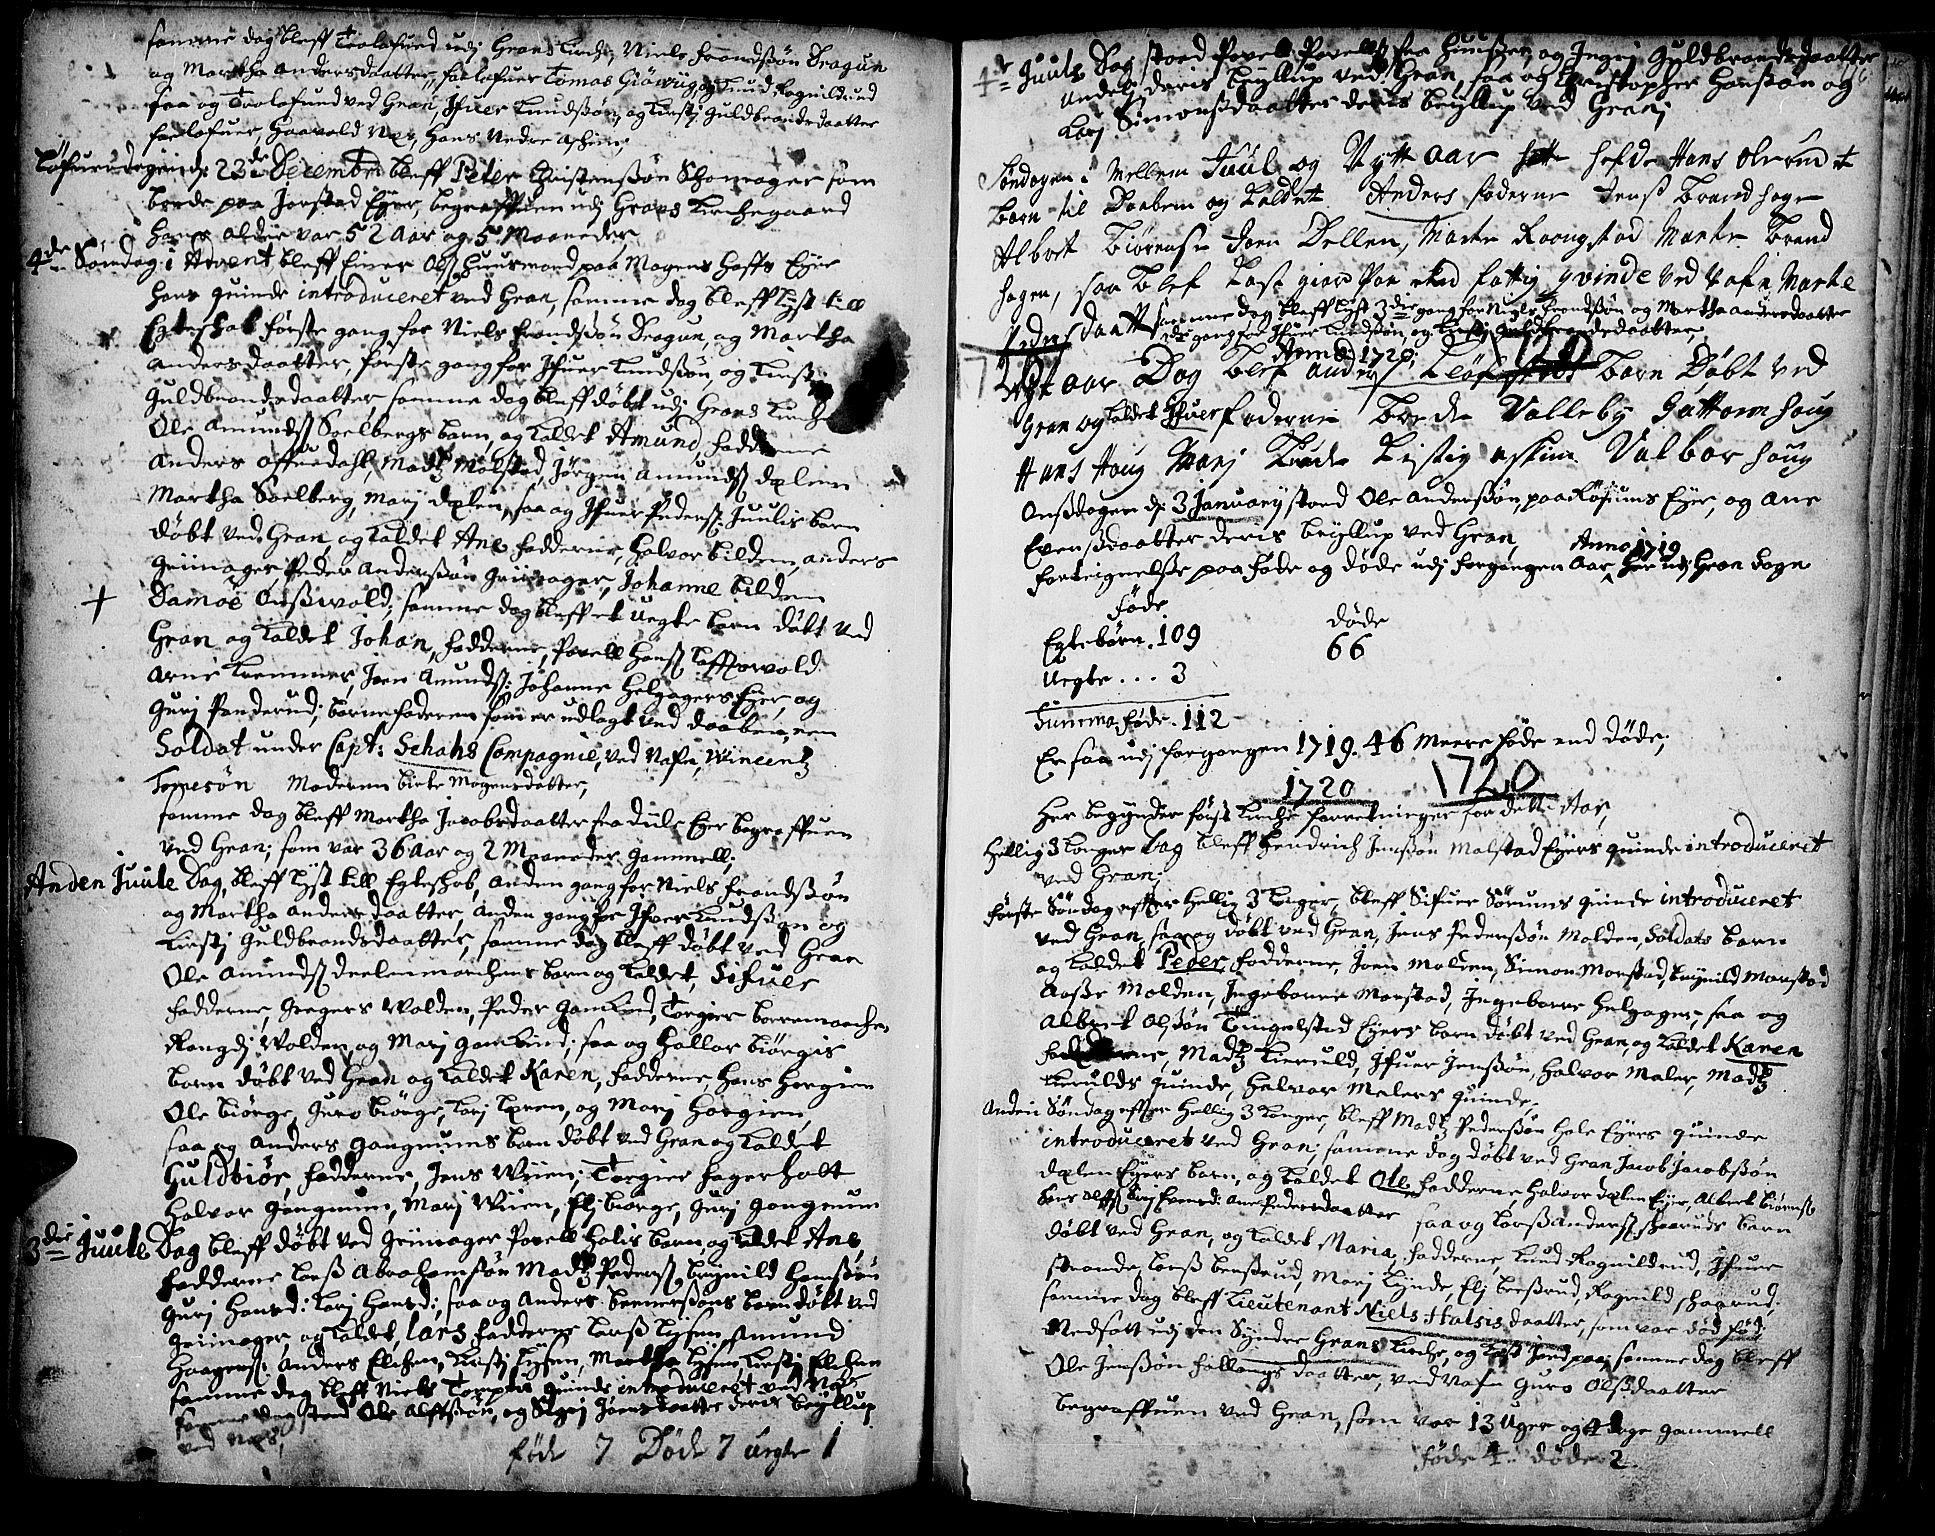 SAH, Gran prestekontor, Ministerialbok nr. 1, 1707-1731, s. 116